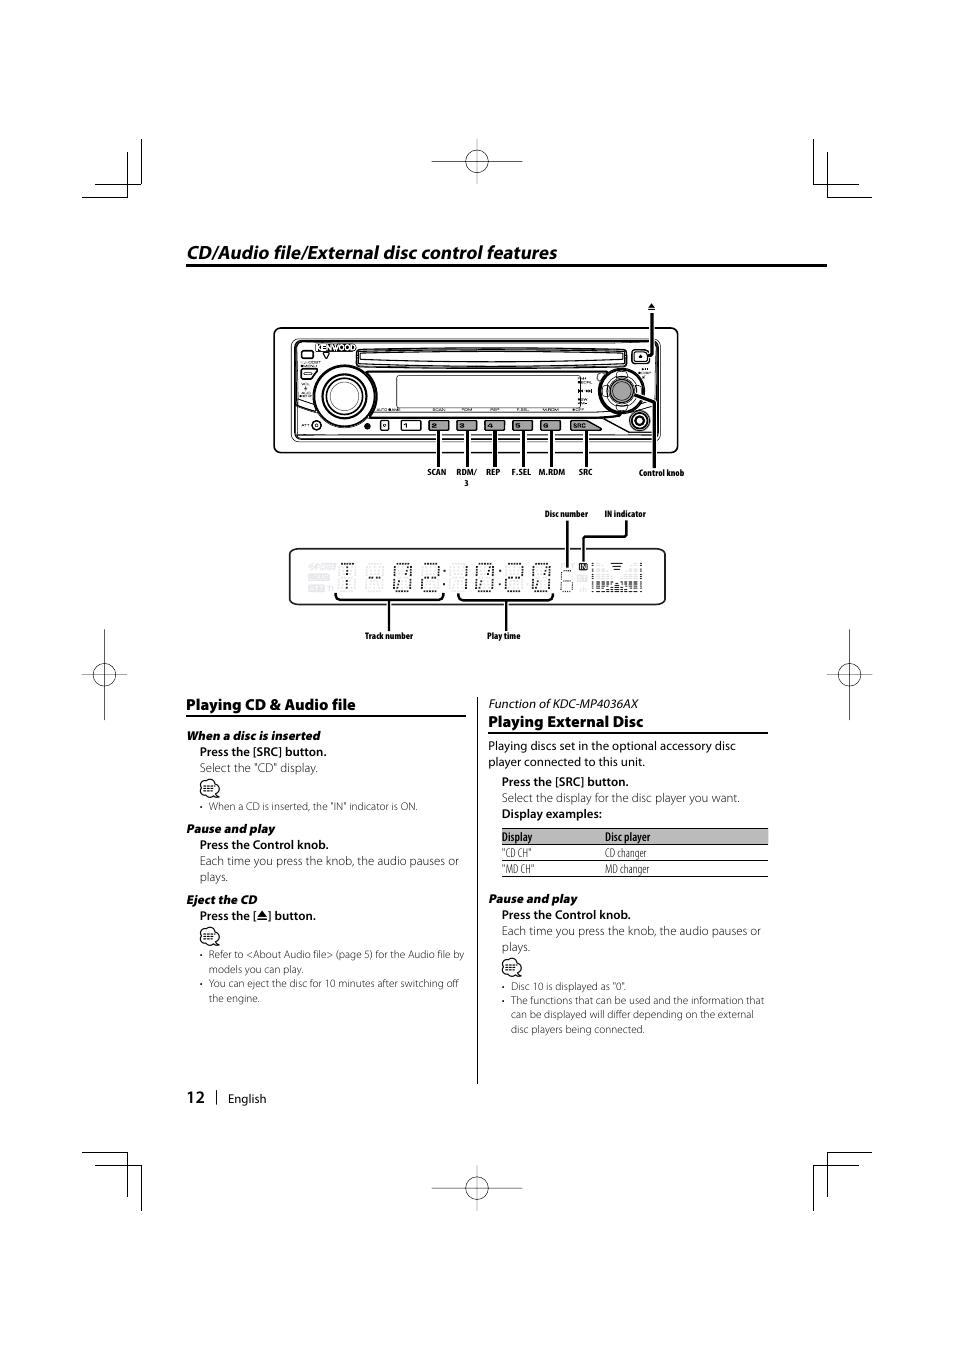 cd audio file external disc control features playing cd audio rh manualsdir com Kenwood Car Stereo Manual Kenwood DDX 370 Instruction Manual